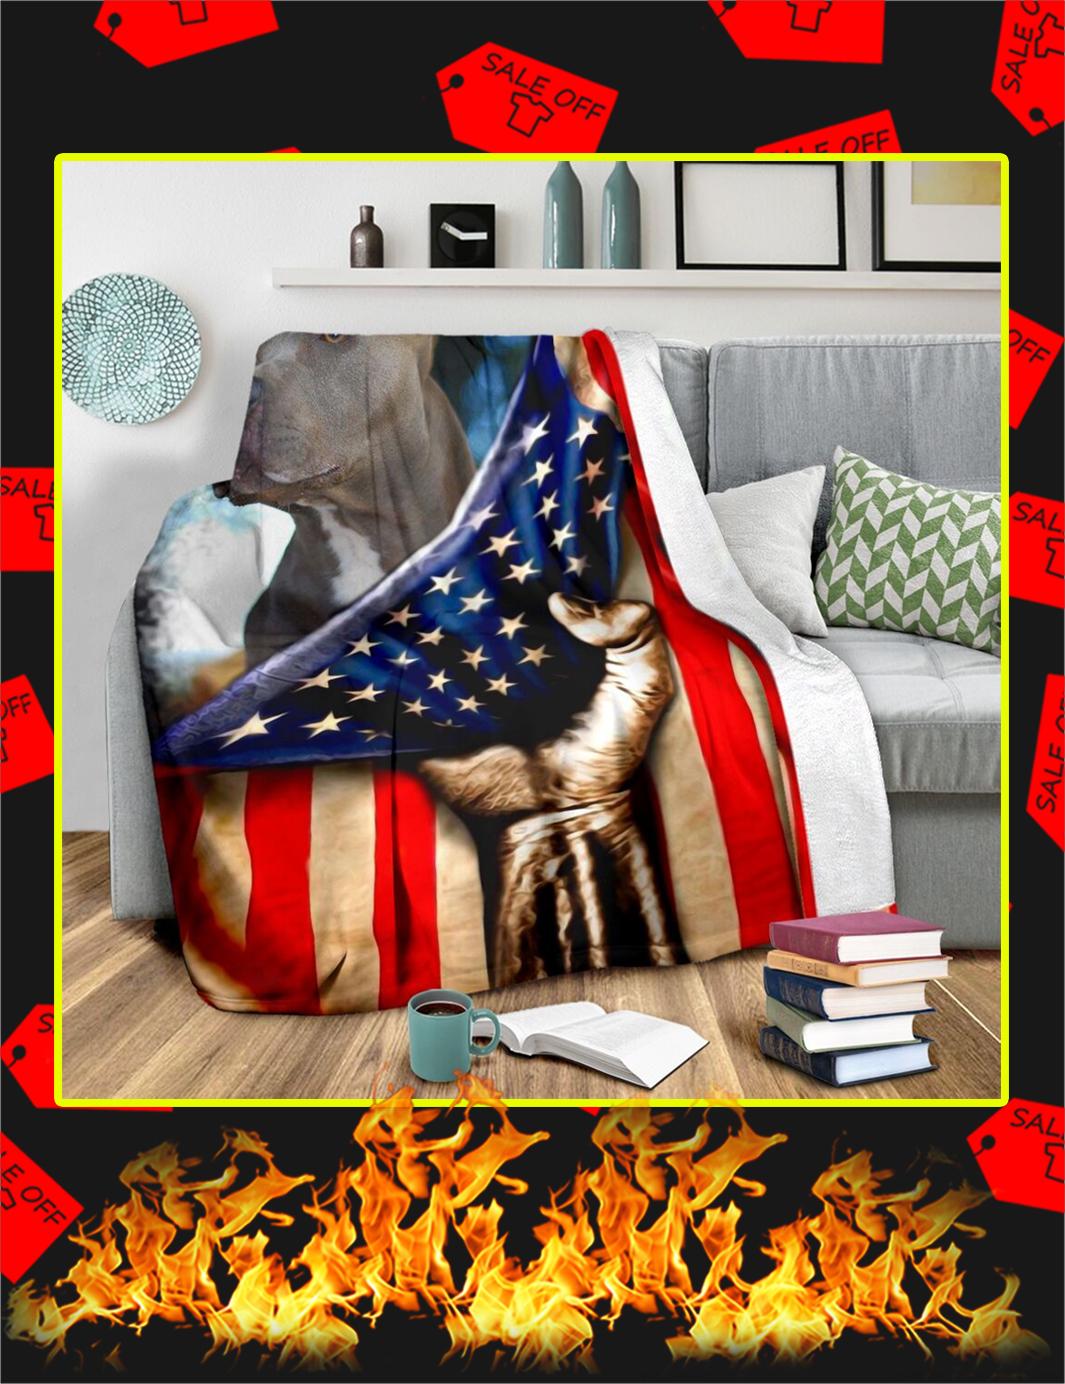 Pitbull Behind American Flag Blanket-youth